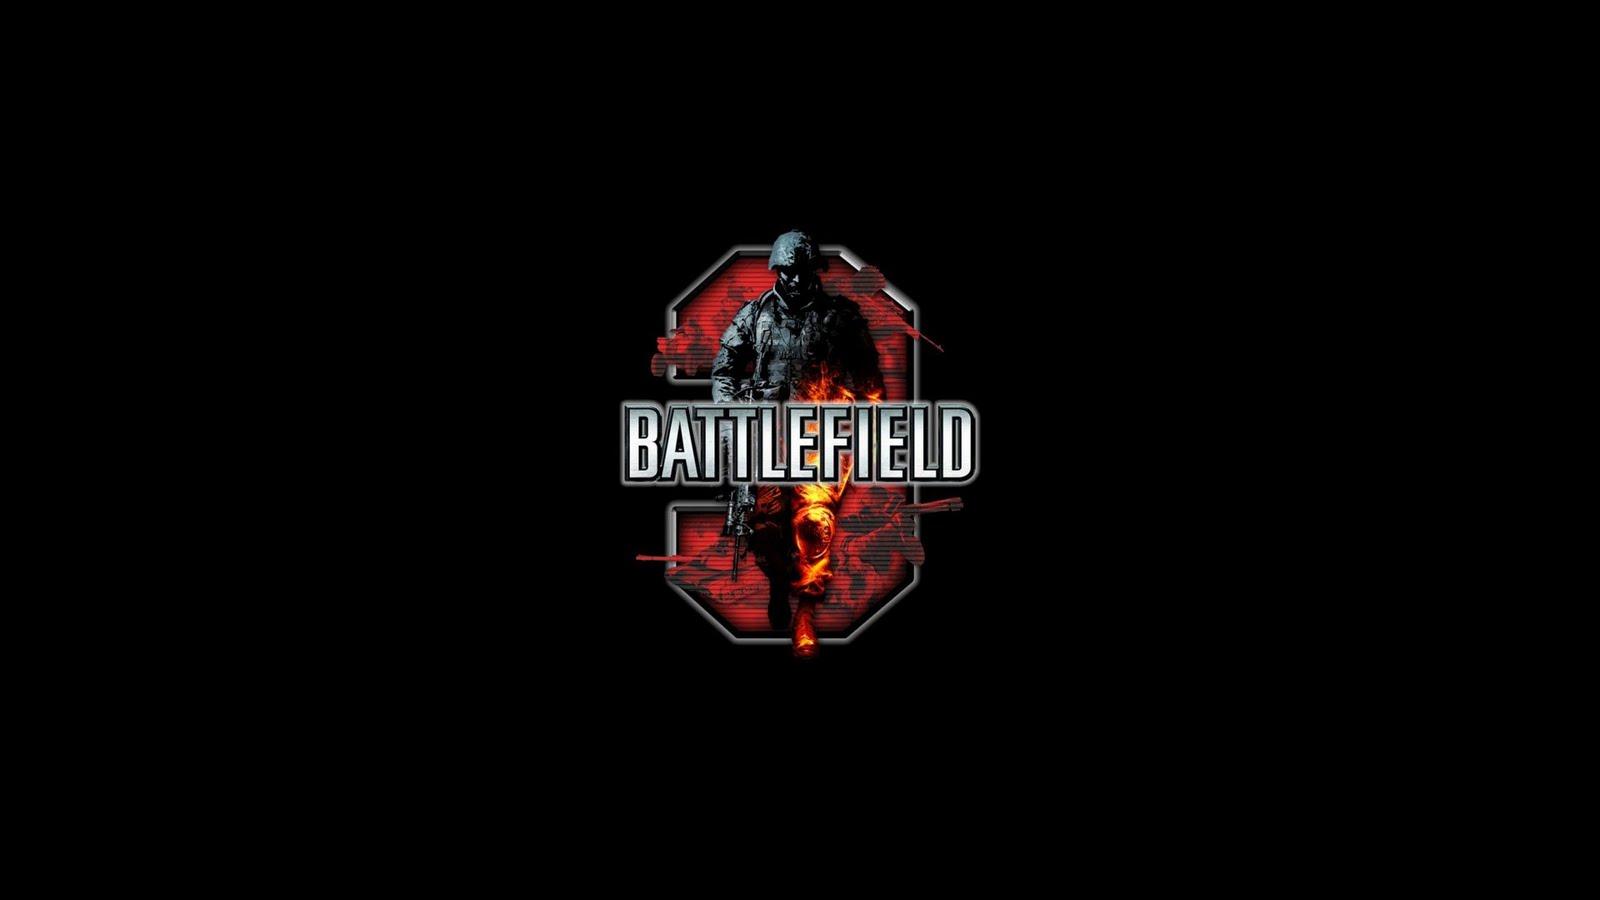 Battlefield 3 HD Wallpaper 1920x1080 ~ 1920x1080 Wallpaper ...